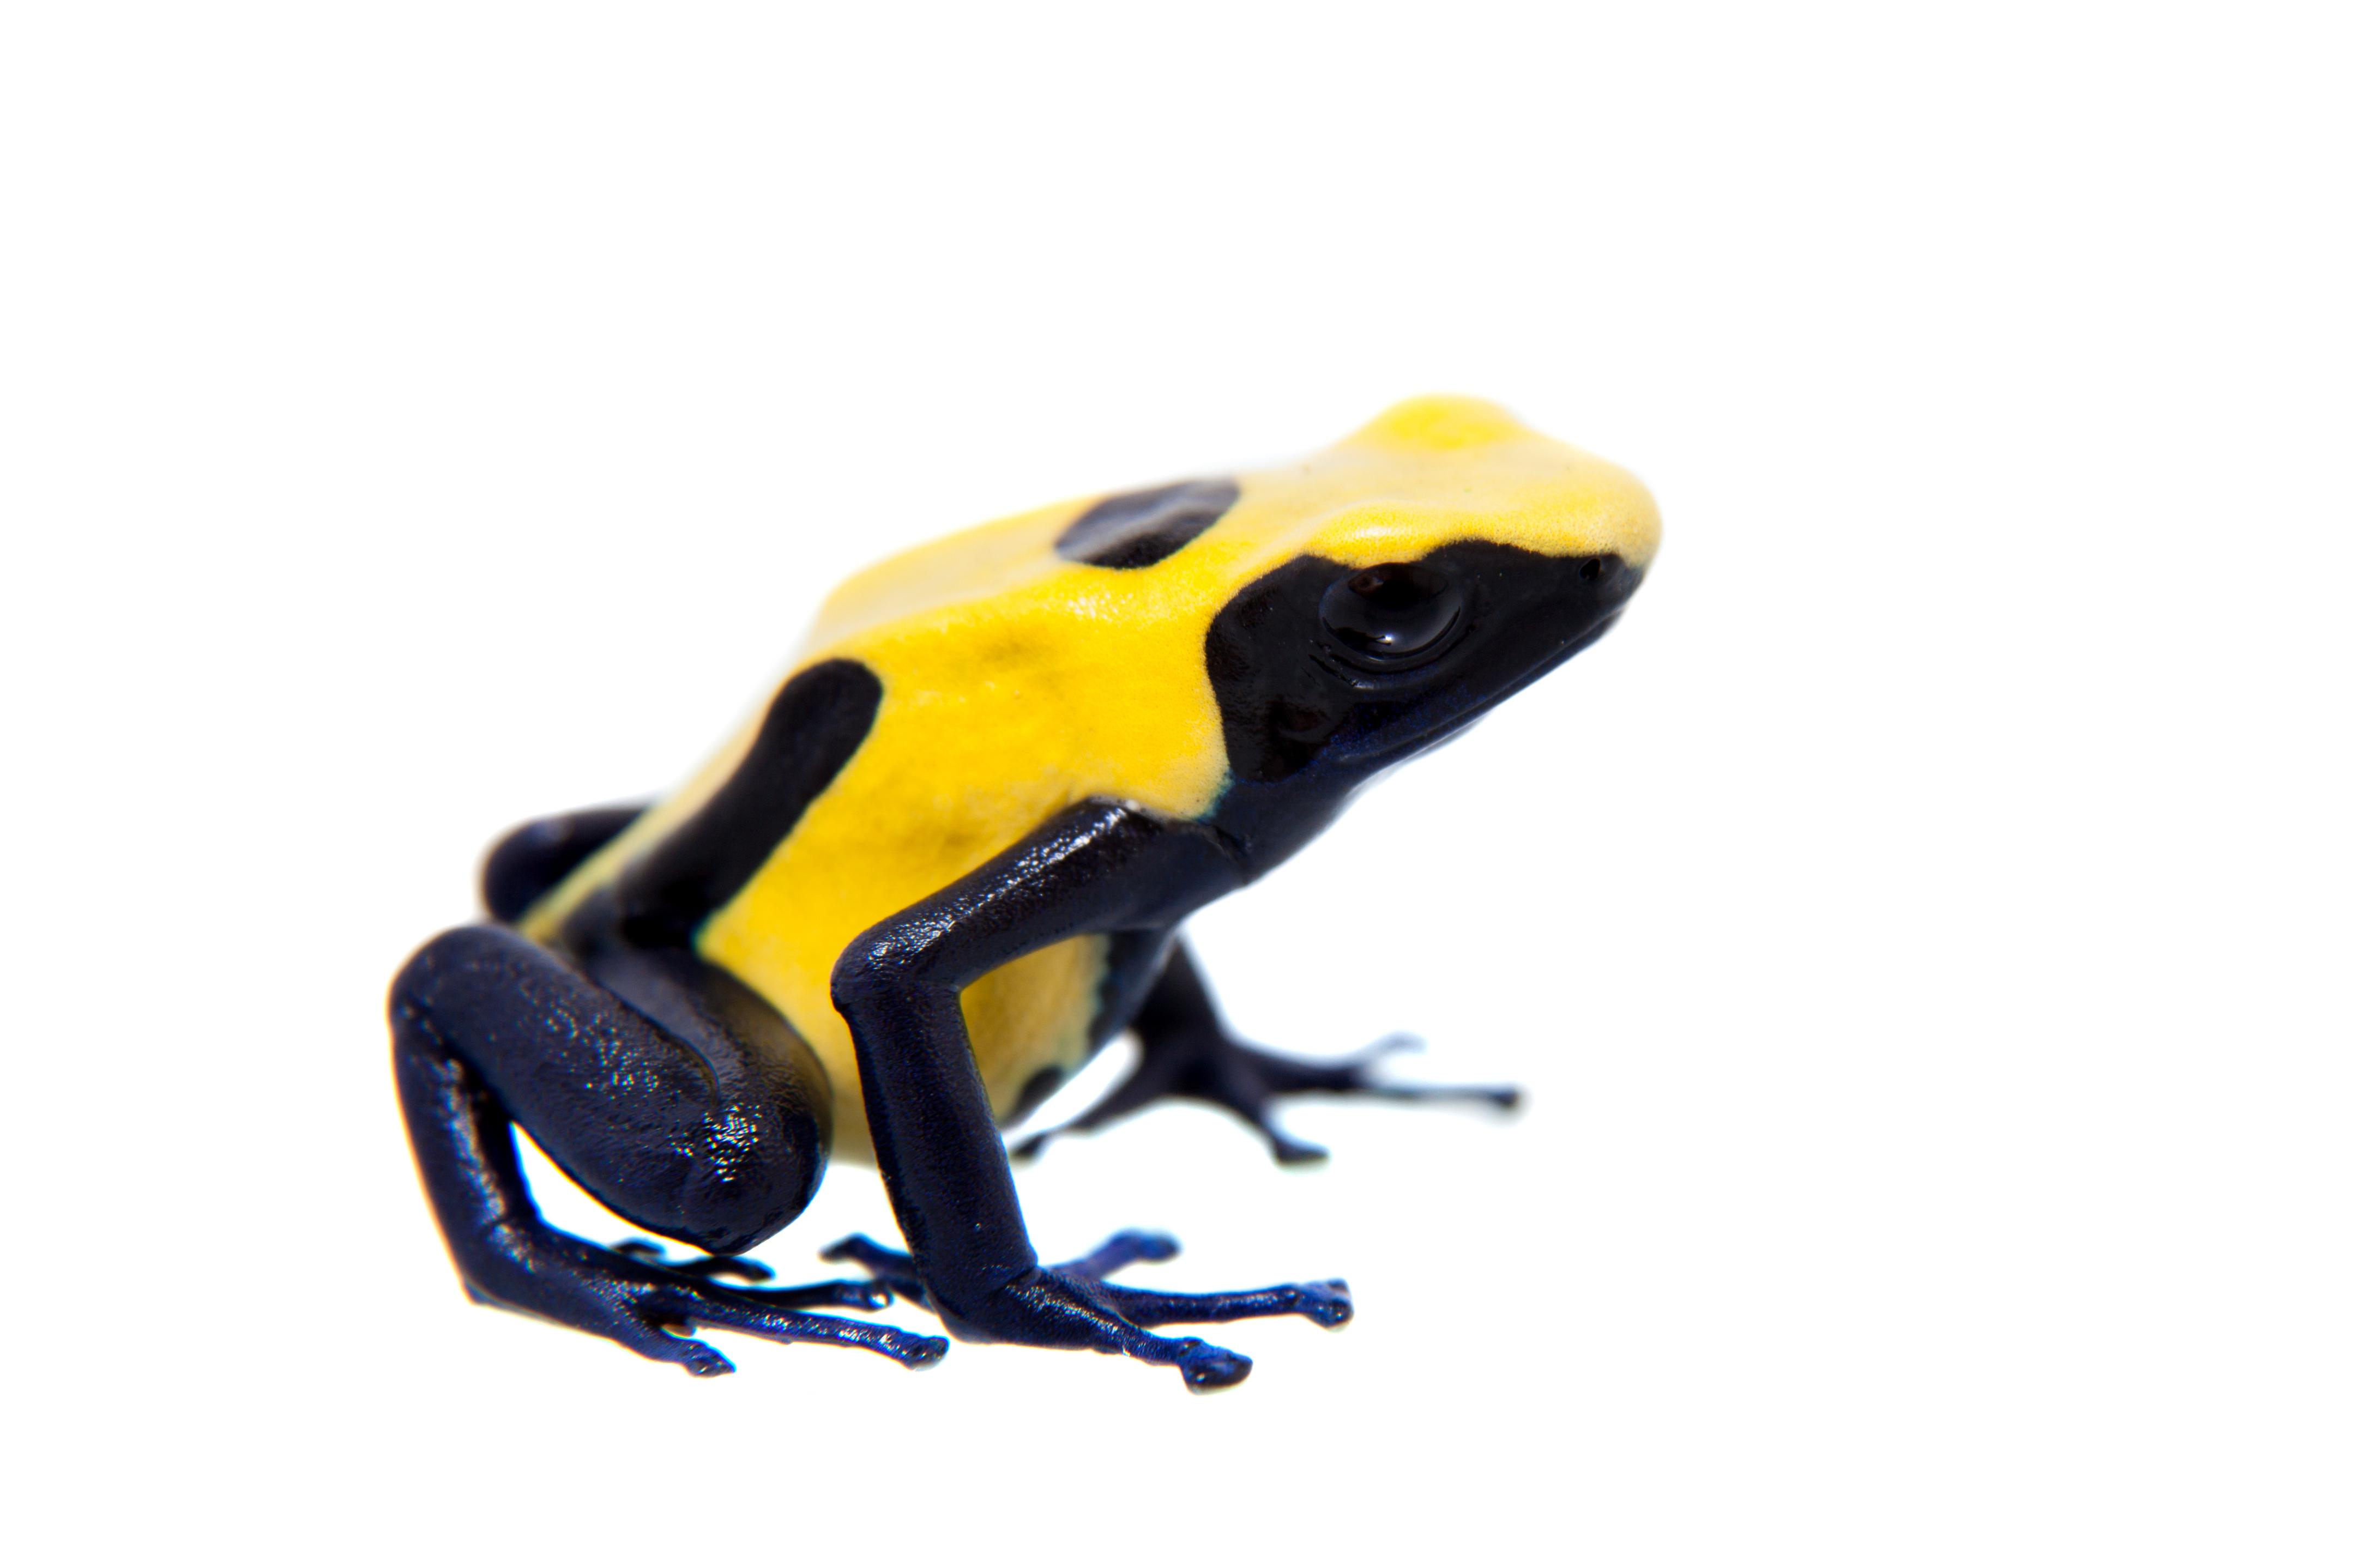 Frog - Dendrobates tinctorius 'Citronella' (froglet)